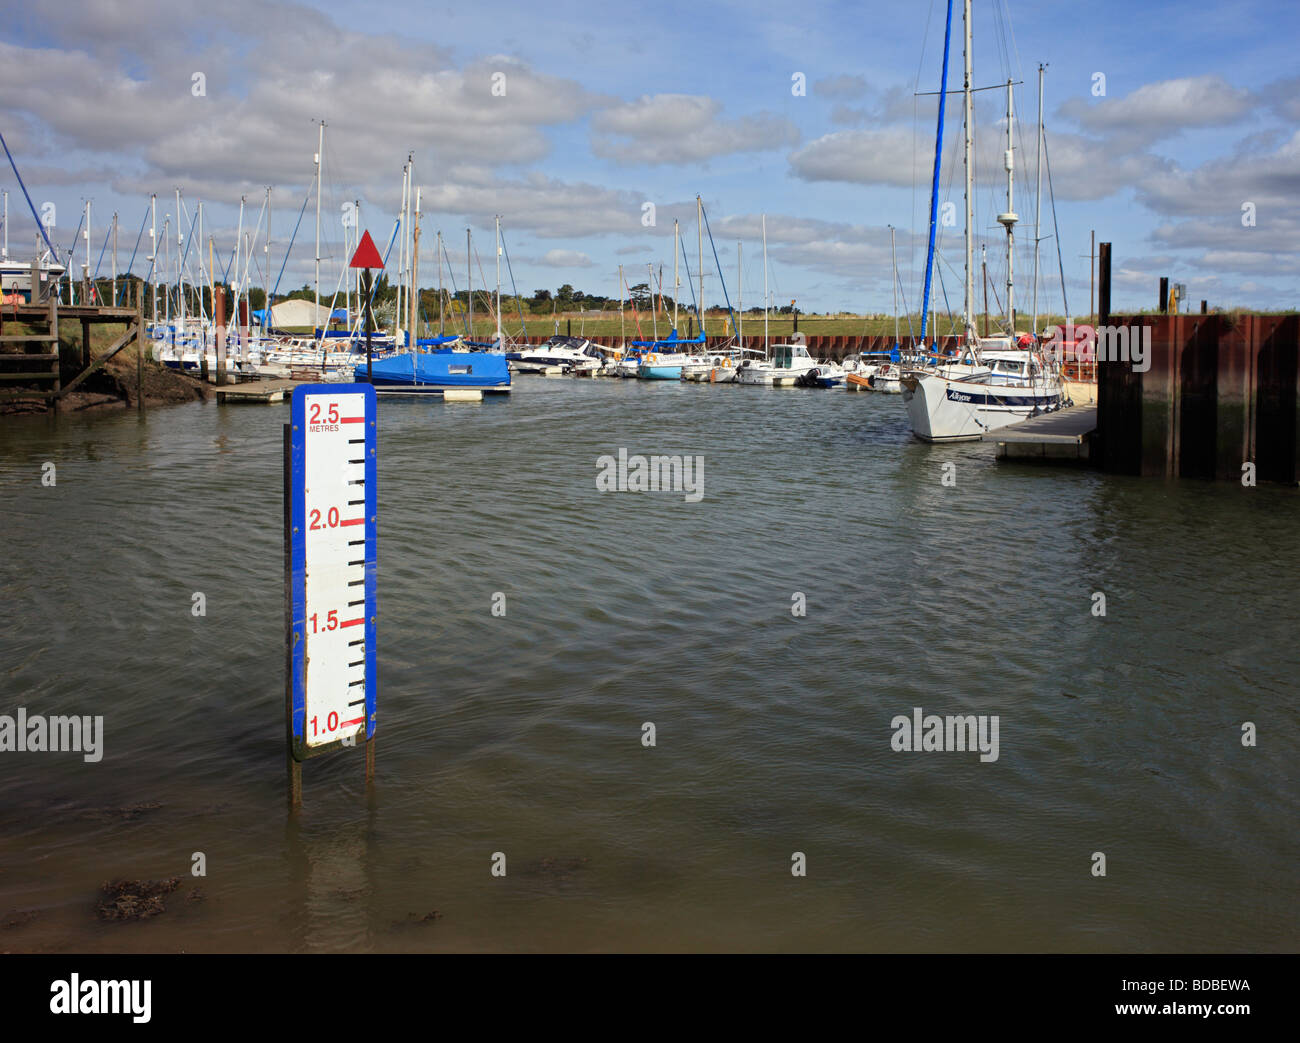 Entrance into Woodbridge harbour. Deben Estuary, Suffolk, East Anglia, England, UK. - Stock Image